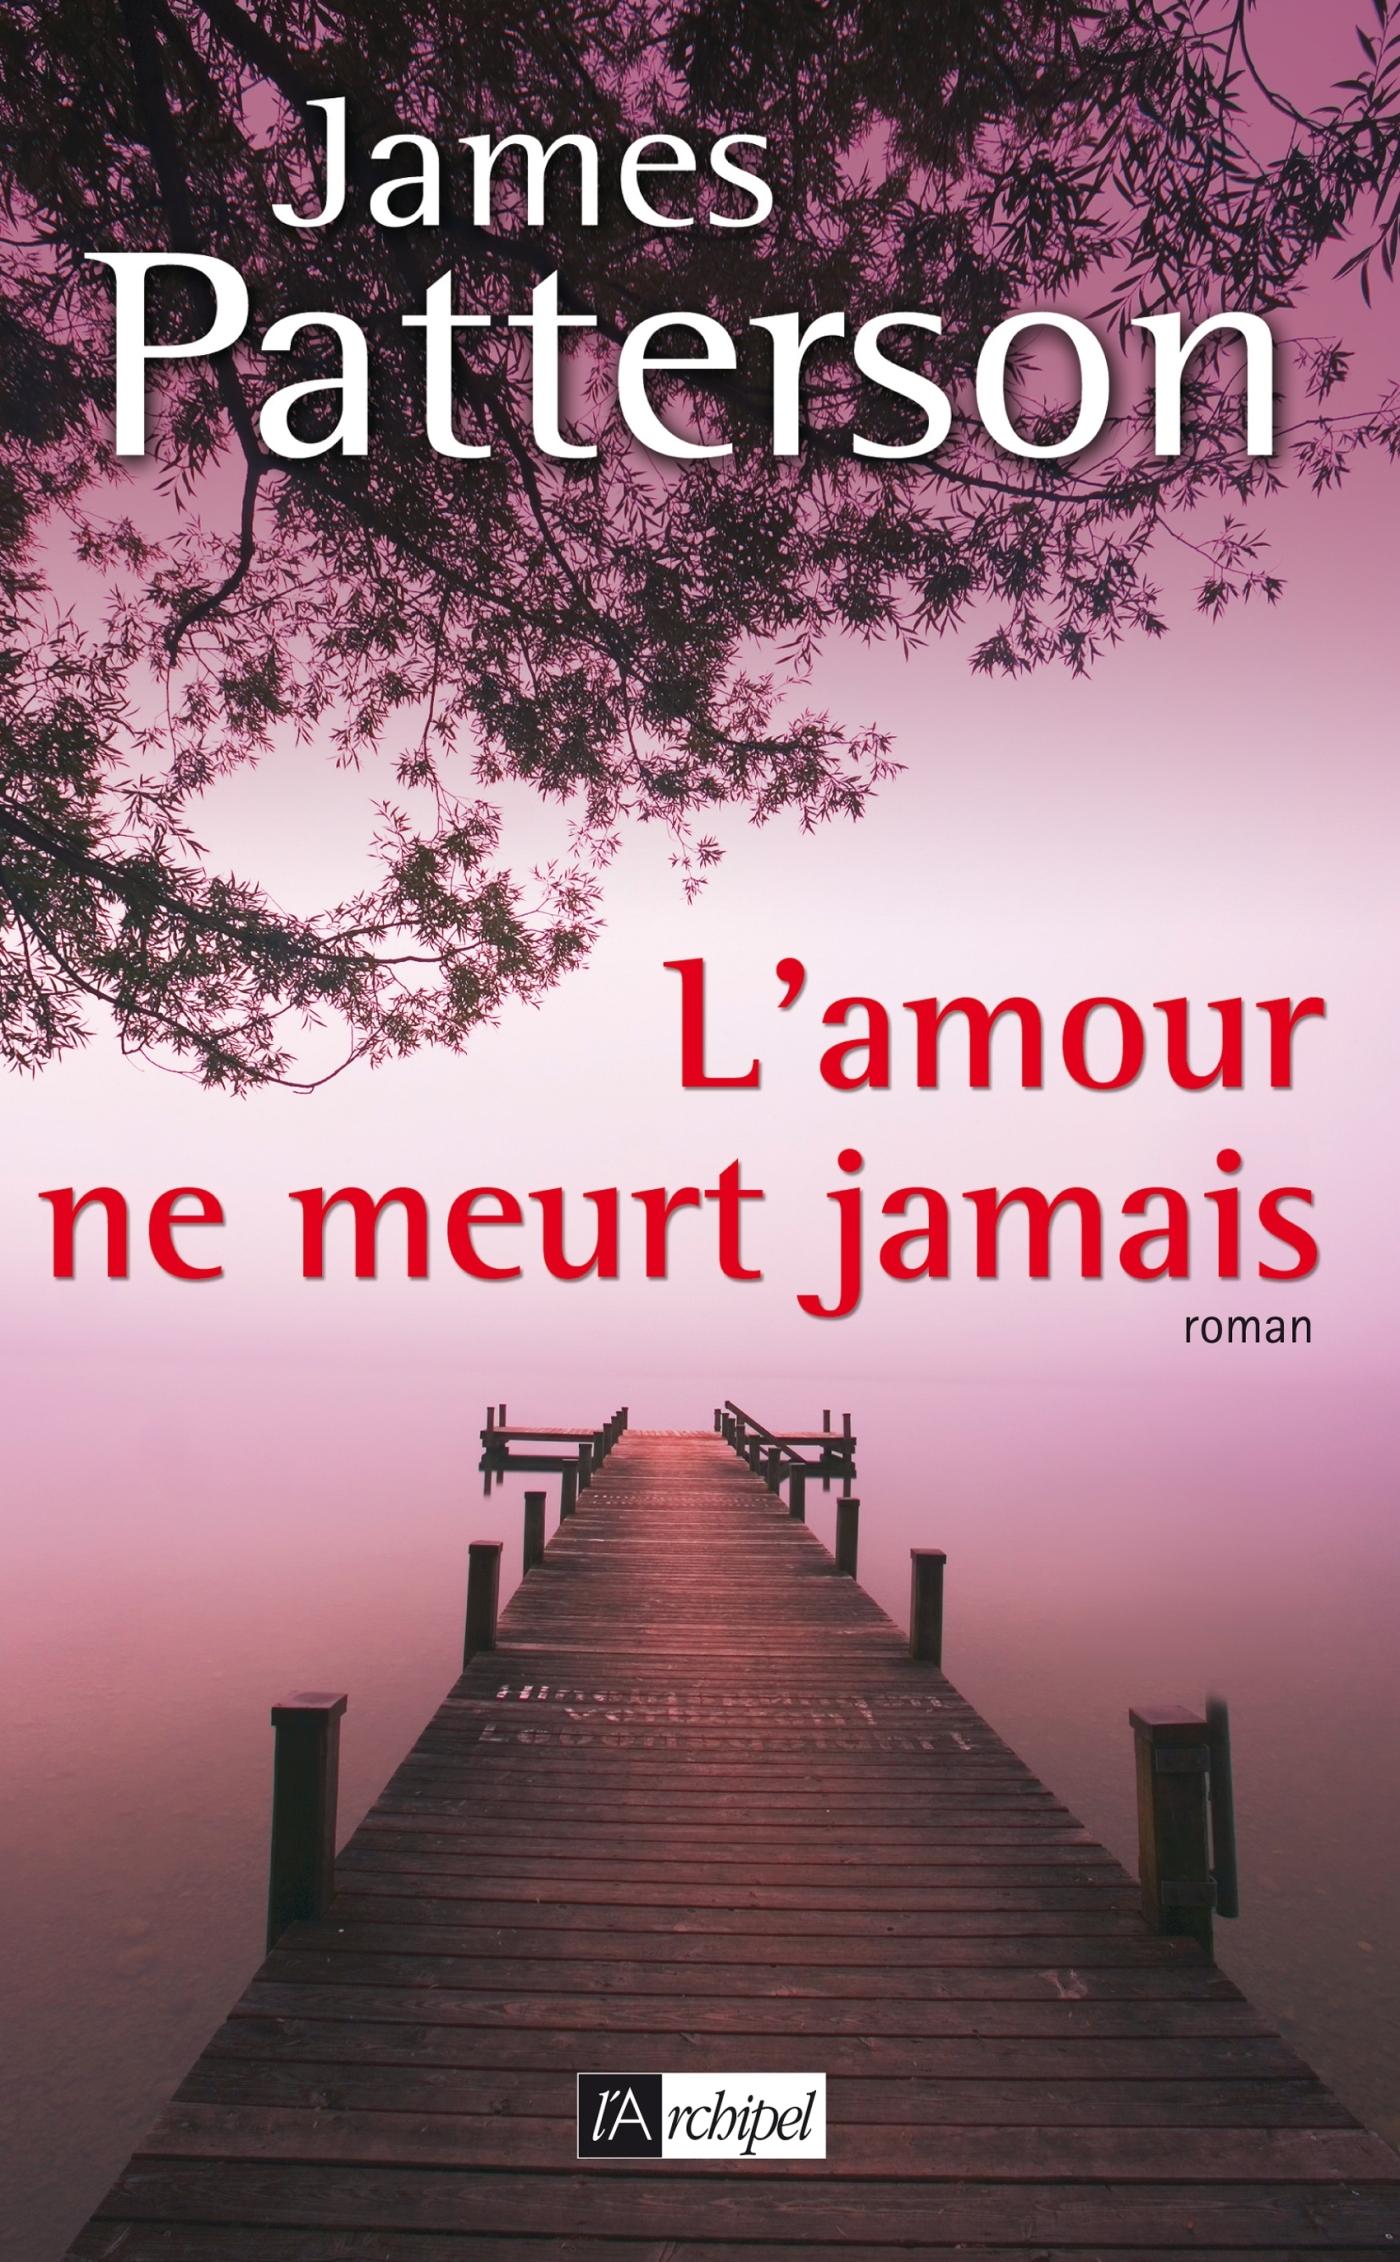 L'AMOUR NE MEURT JAMAIS